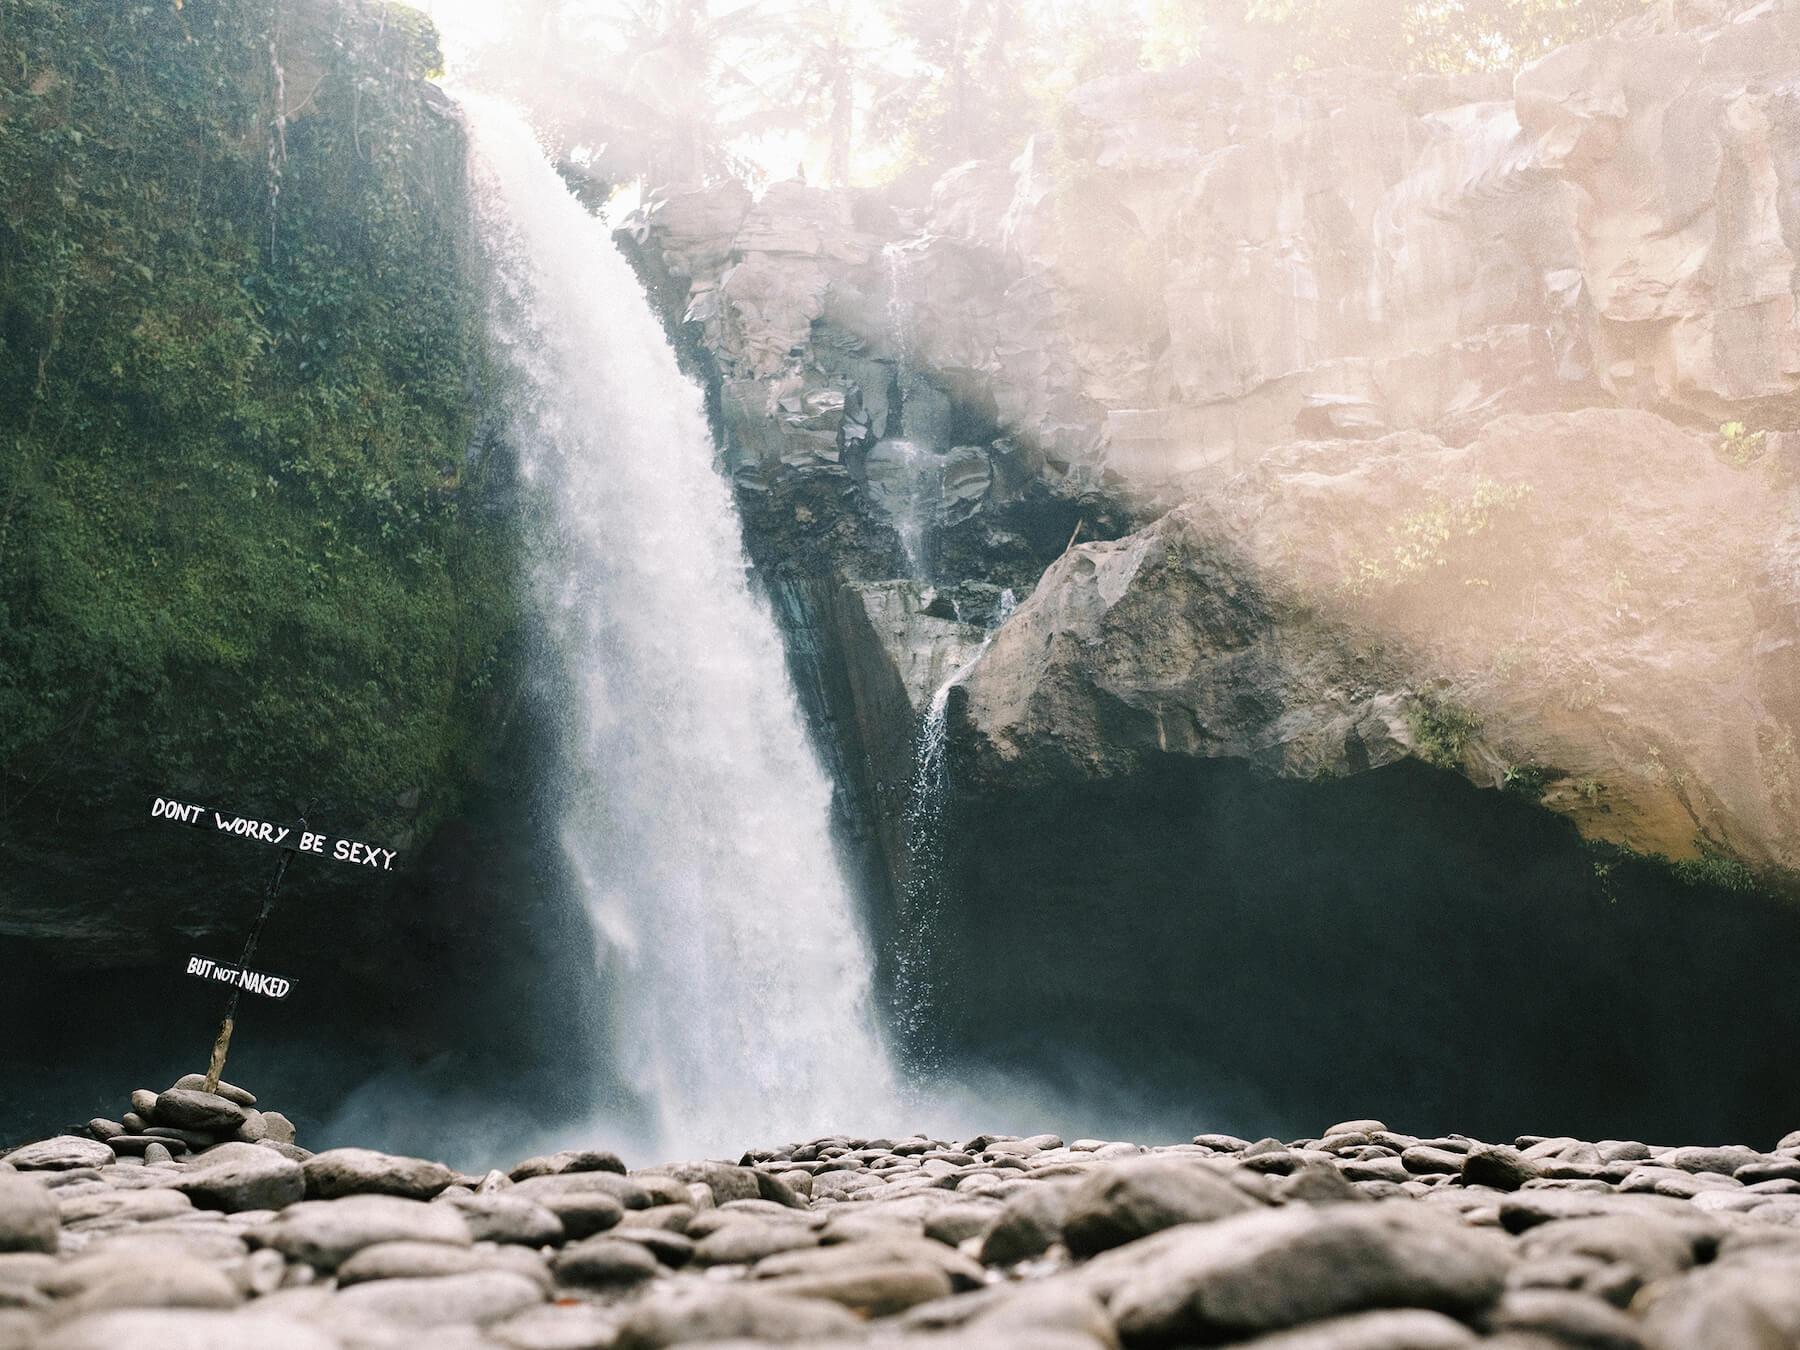 Travel home decor, fine art print of Blangsinga Waterfall in Bali, Indonesia